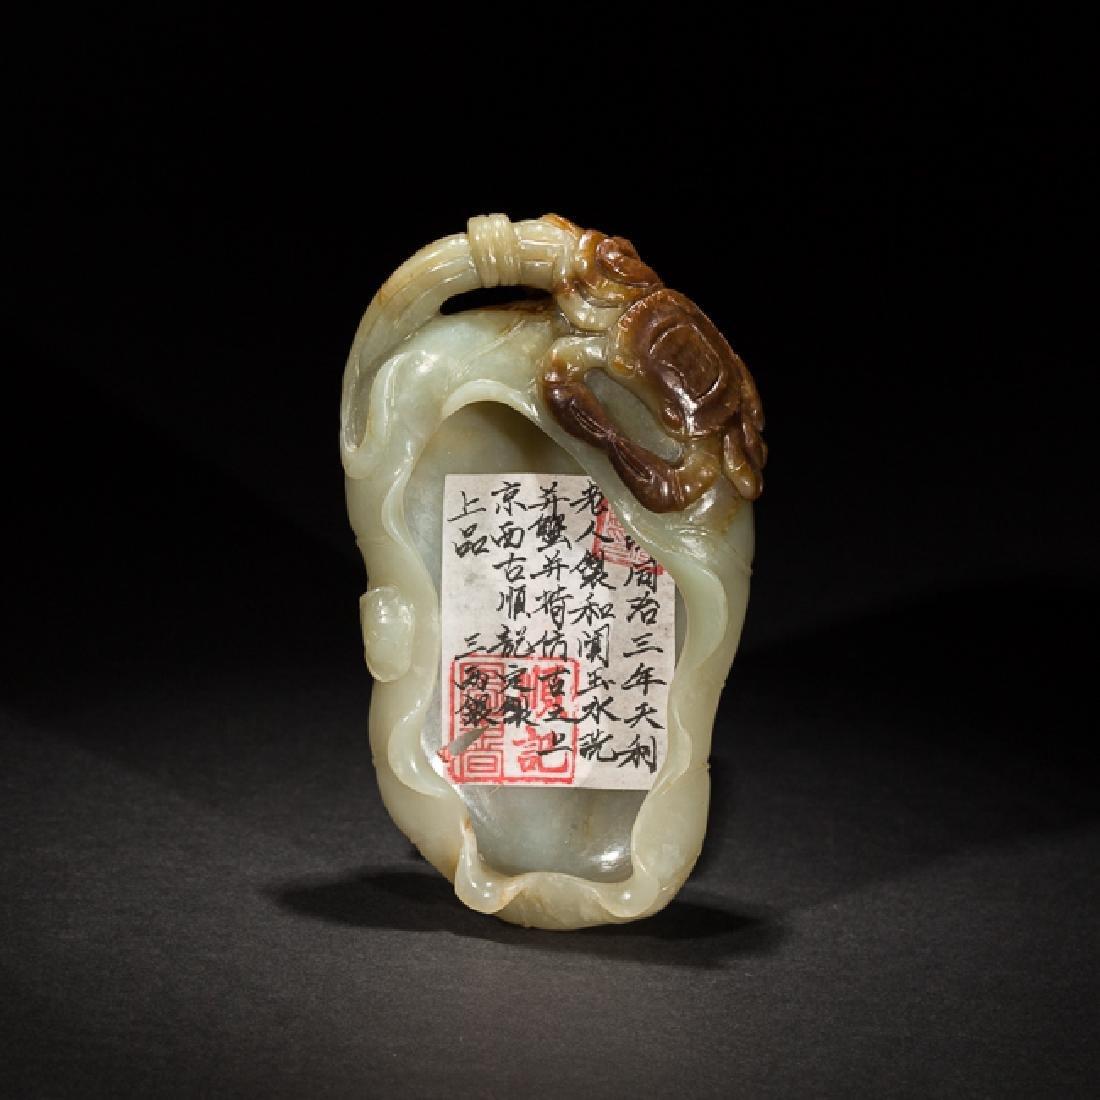 Chinese Antique Celadon Jade Brush Washer, 19th Century